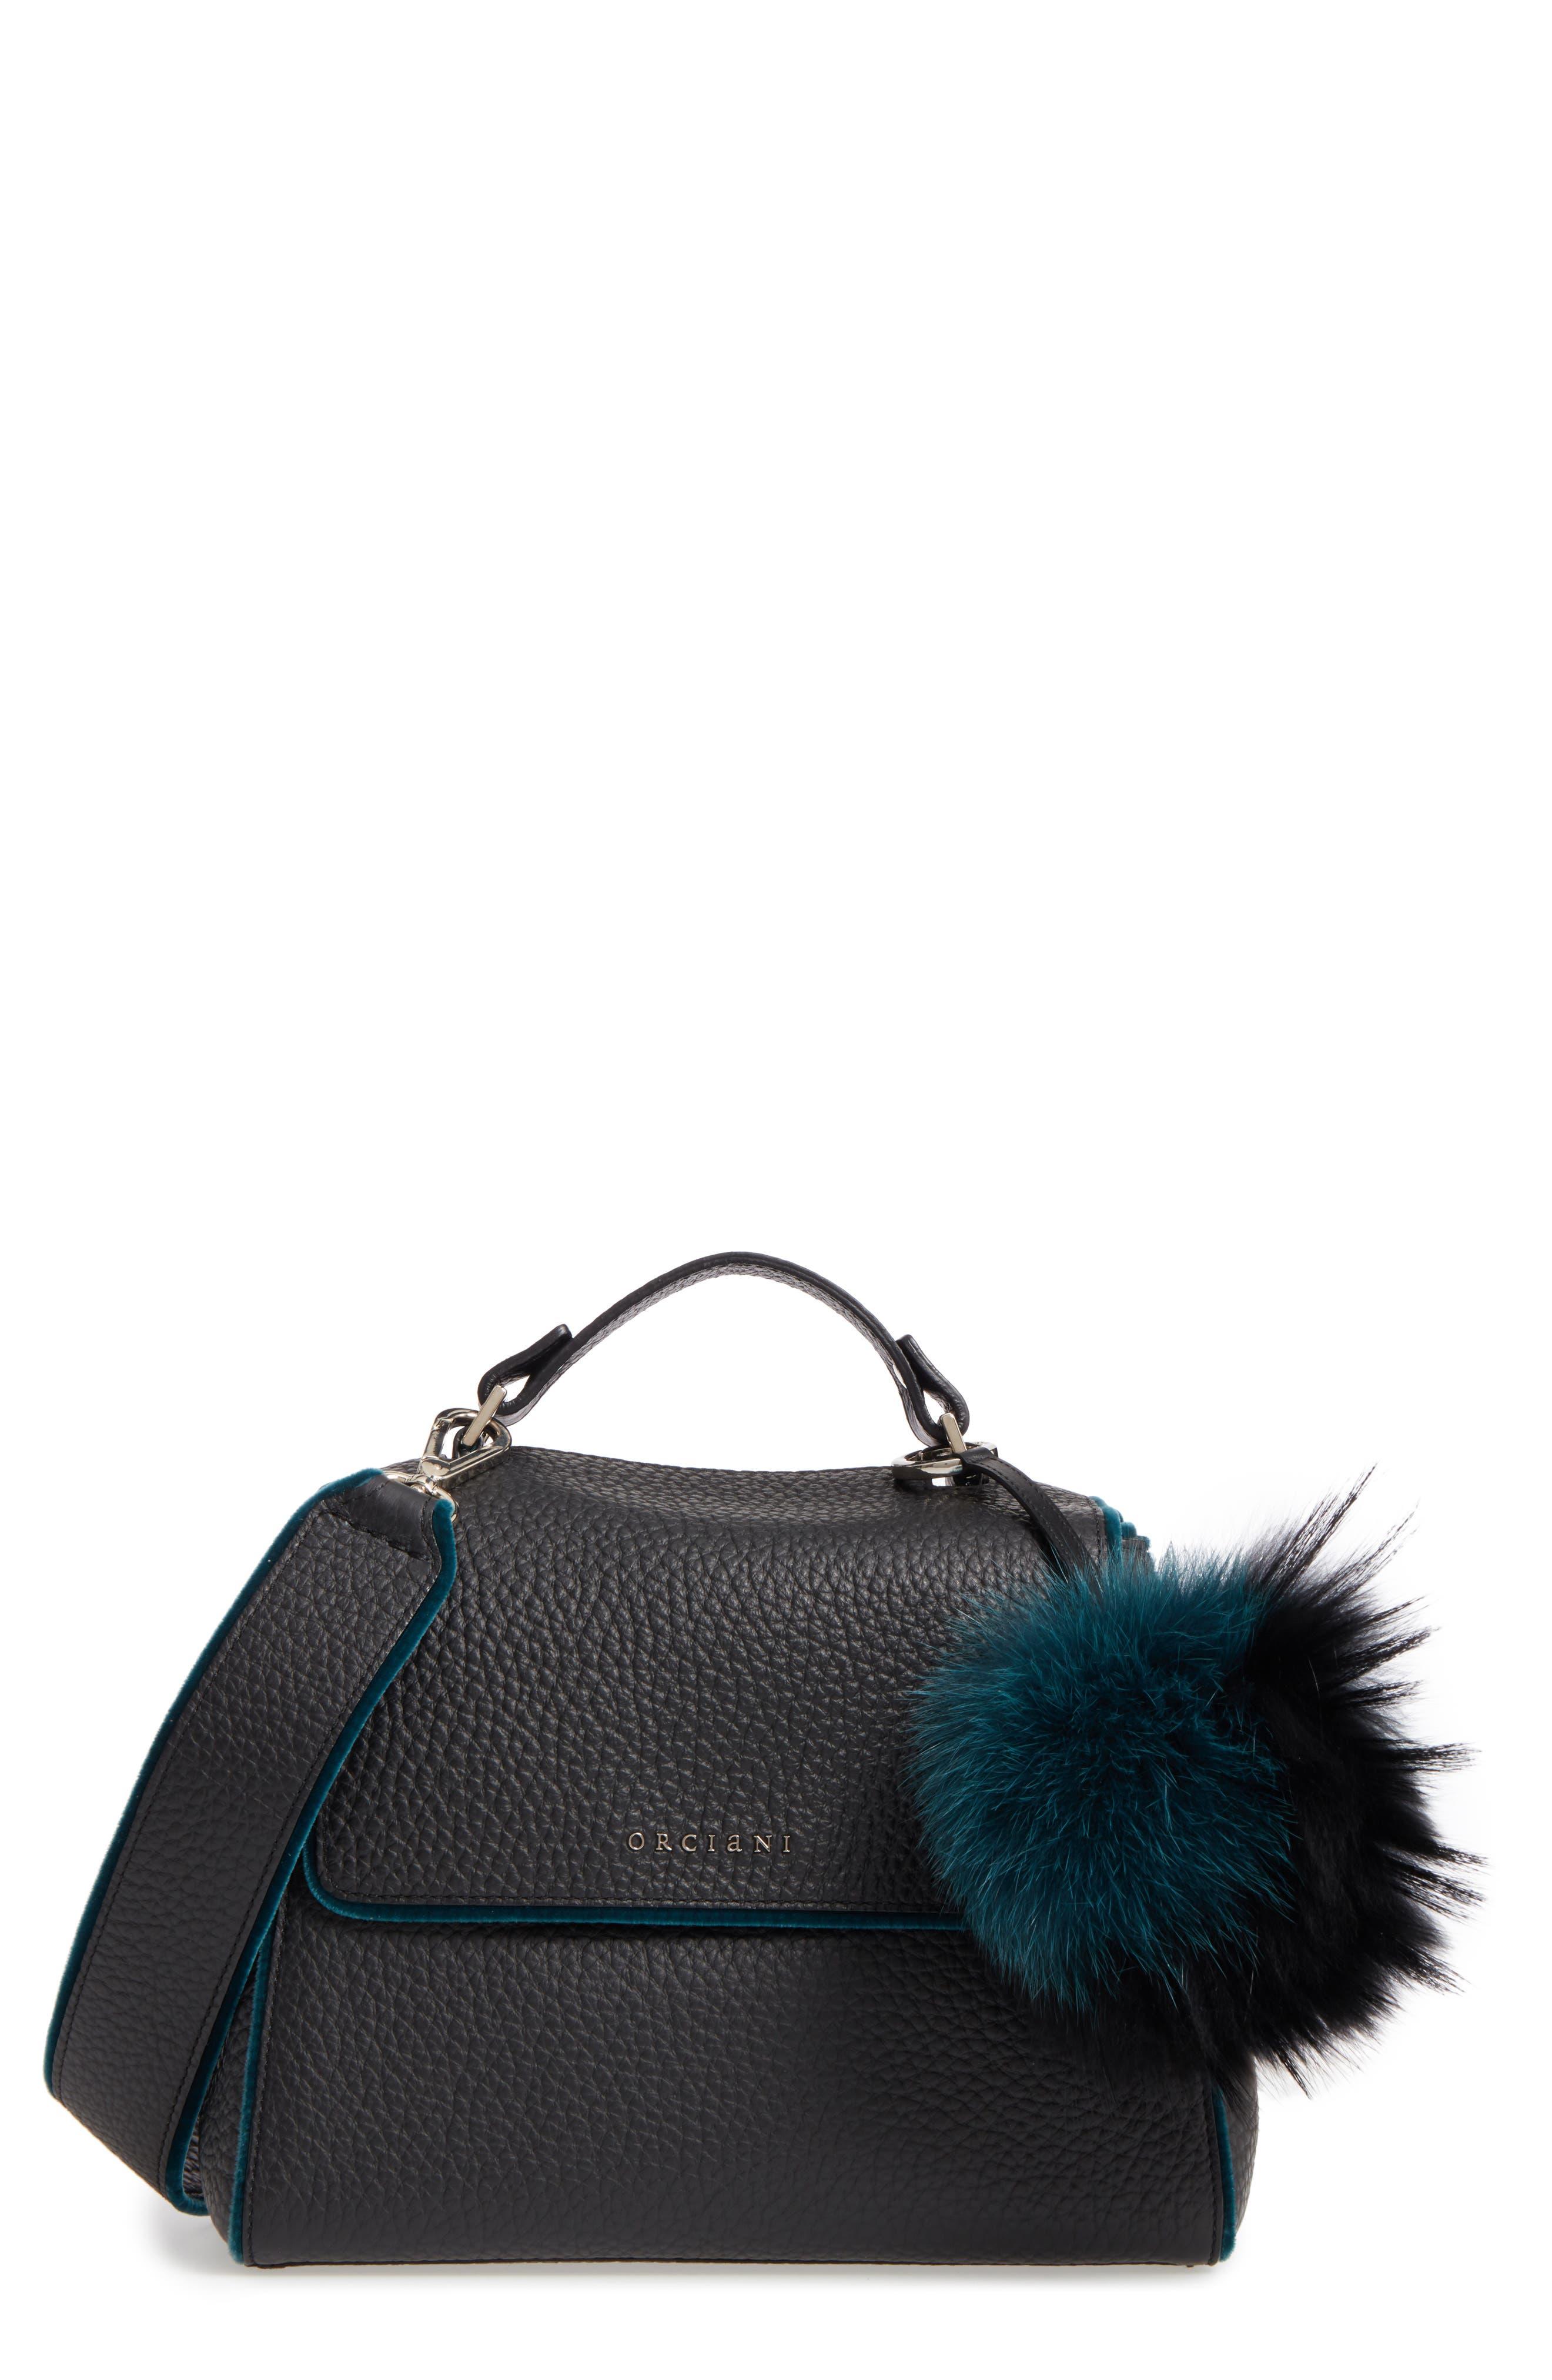 Small Sveva Soft Leather Top Handle Satchel with Genuine Fur Bag Charm,                         Main,                         color, 300